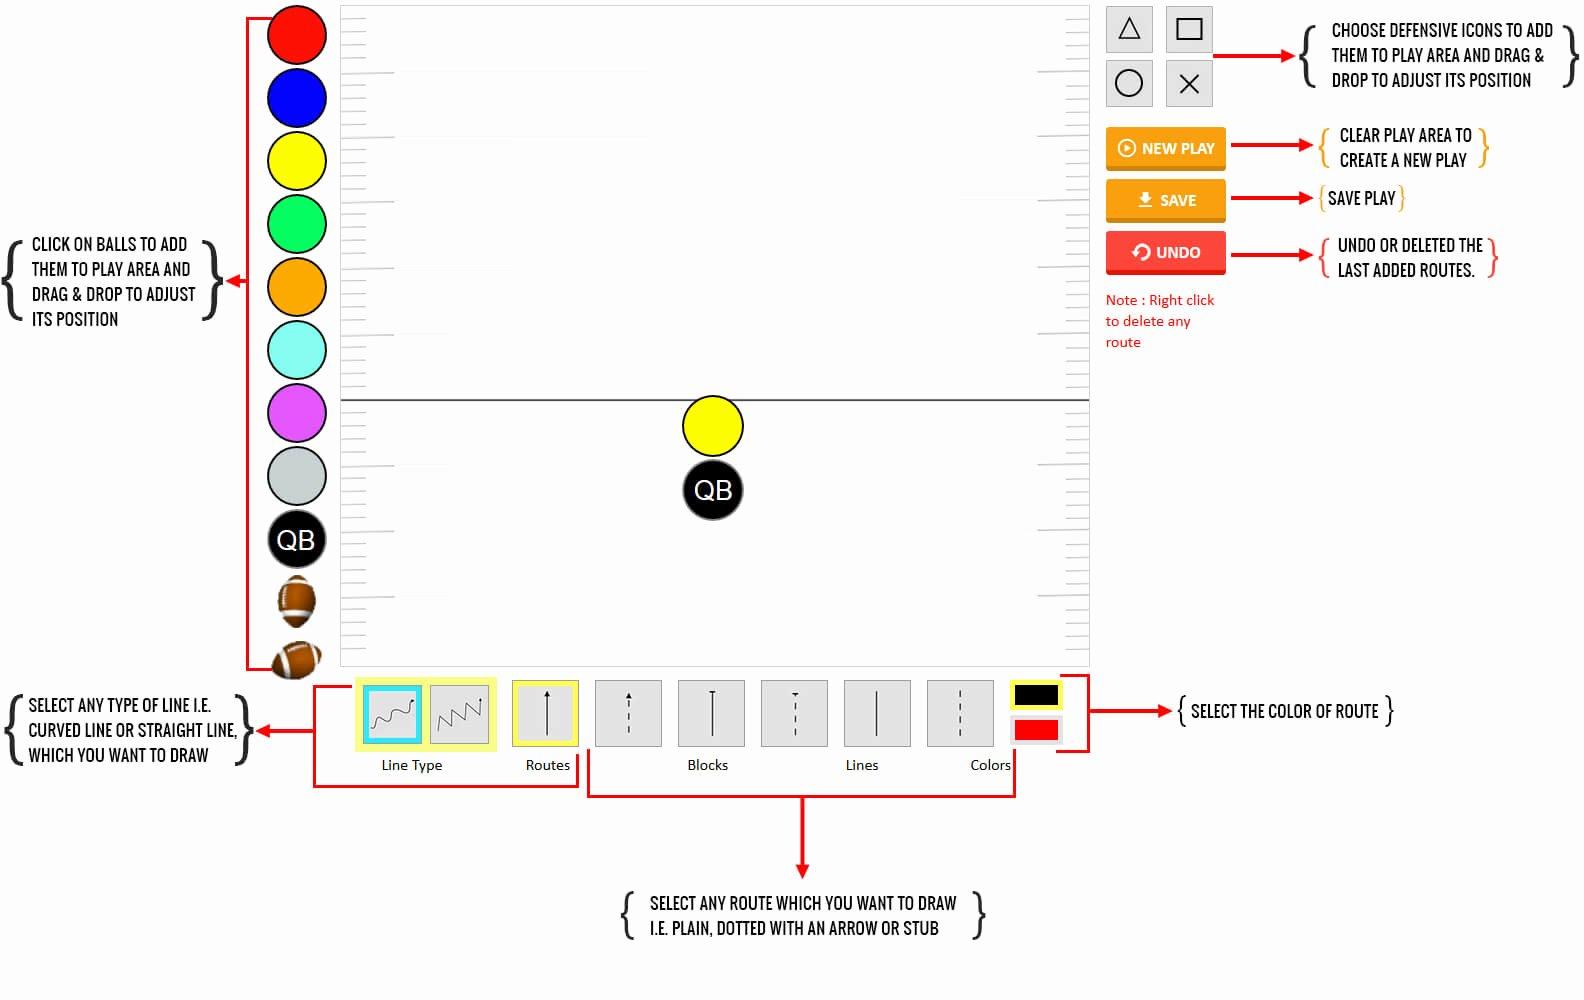 Football Wristband Template Lovely Football Plays 101 How to Design A Killer Football